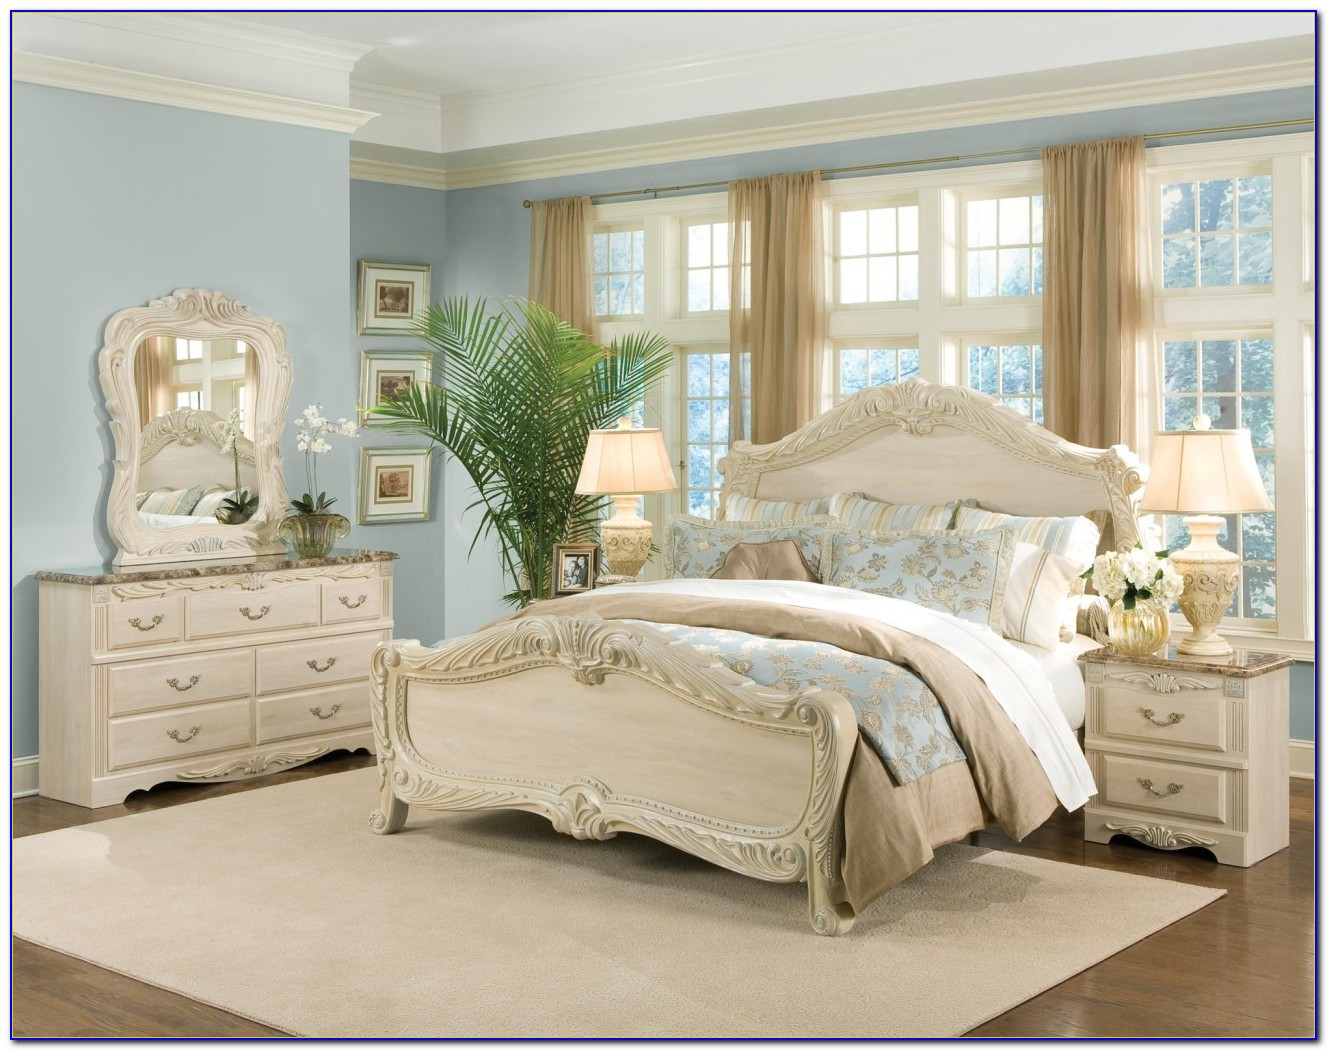 Bedroom Furniture Sets In White